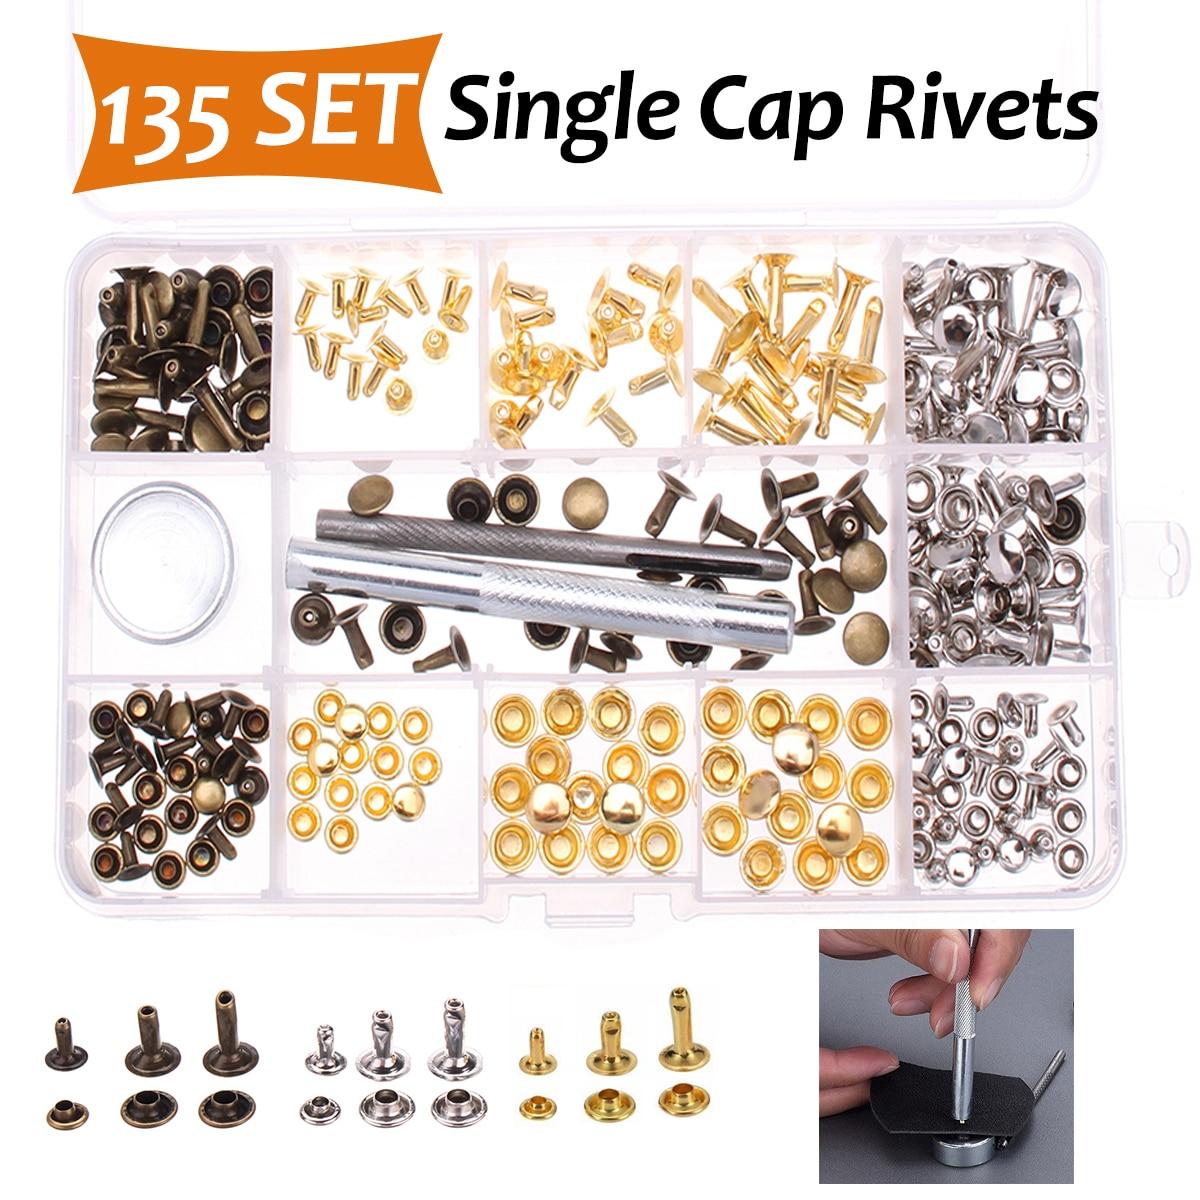 138 Set Single Cap Rivet Tubular Metal Studs W/ Fixing Tool For Leather Craft Repairing Decor Leather Rivets 3 Colors 3 Sizes